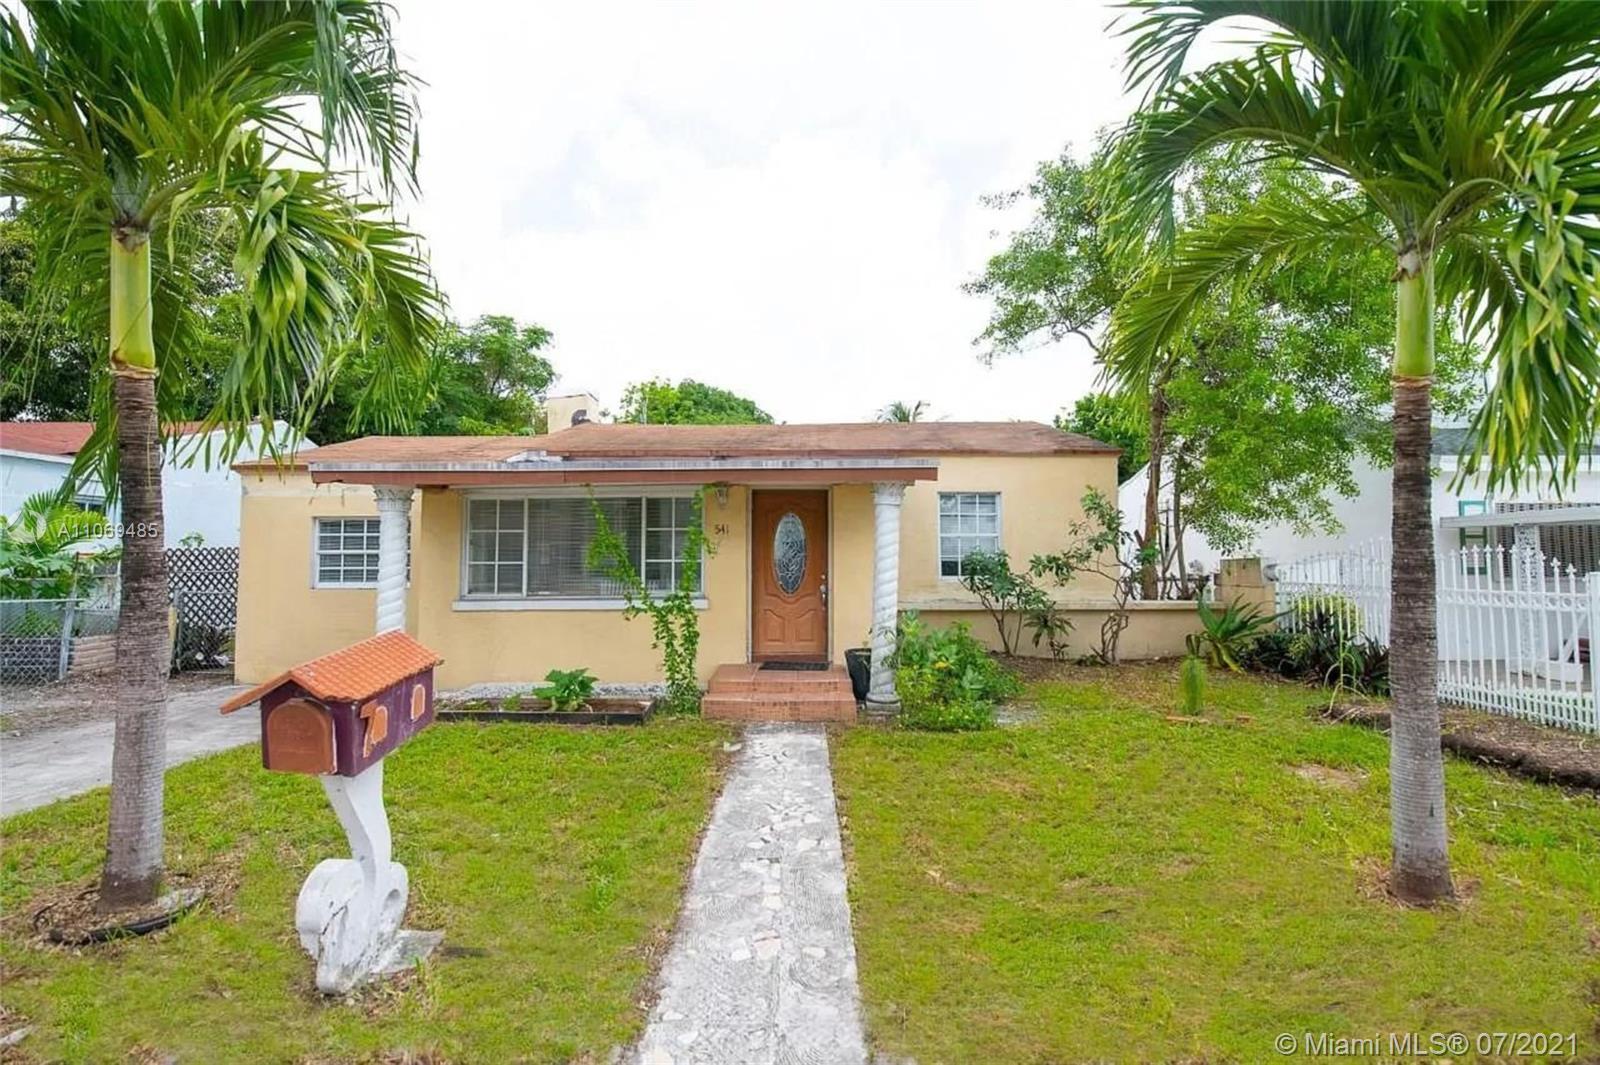 Bay Vista Park - 541 NW 49th St, Miami, FL 33127